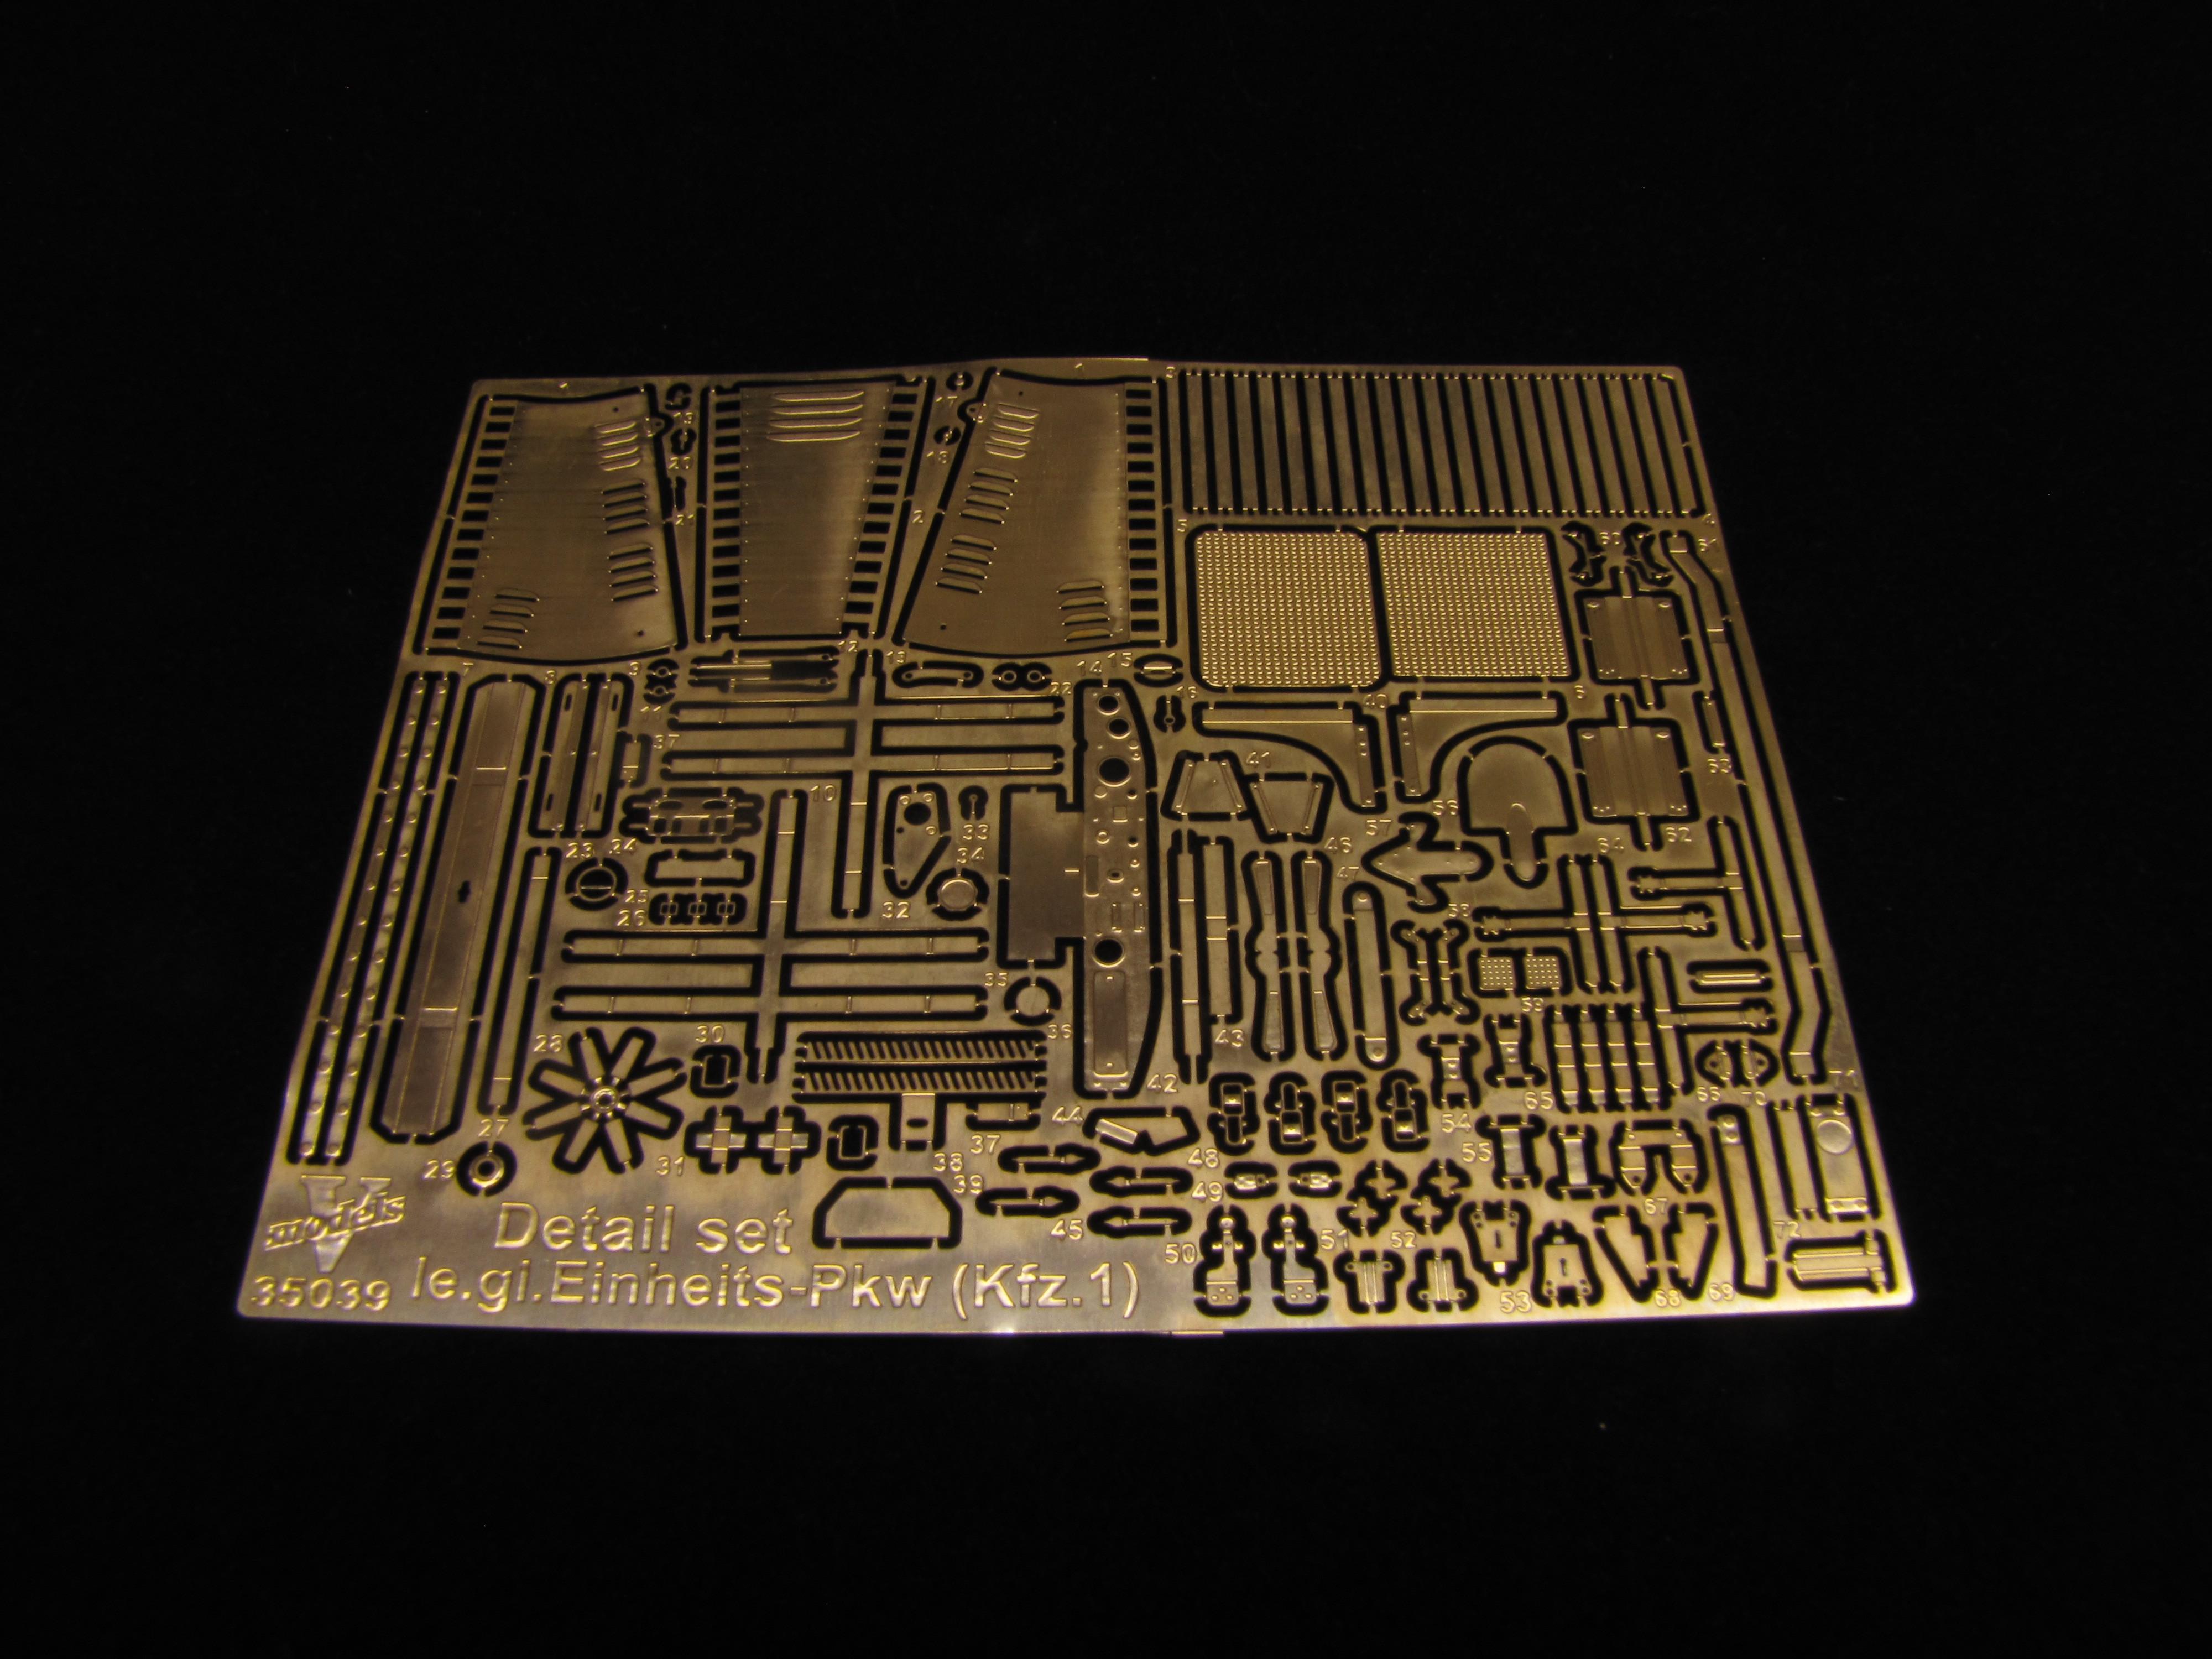 Detail  set le,gl.Einheits-Pkw(Kfz,1) (ICM model kit) 35039